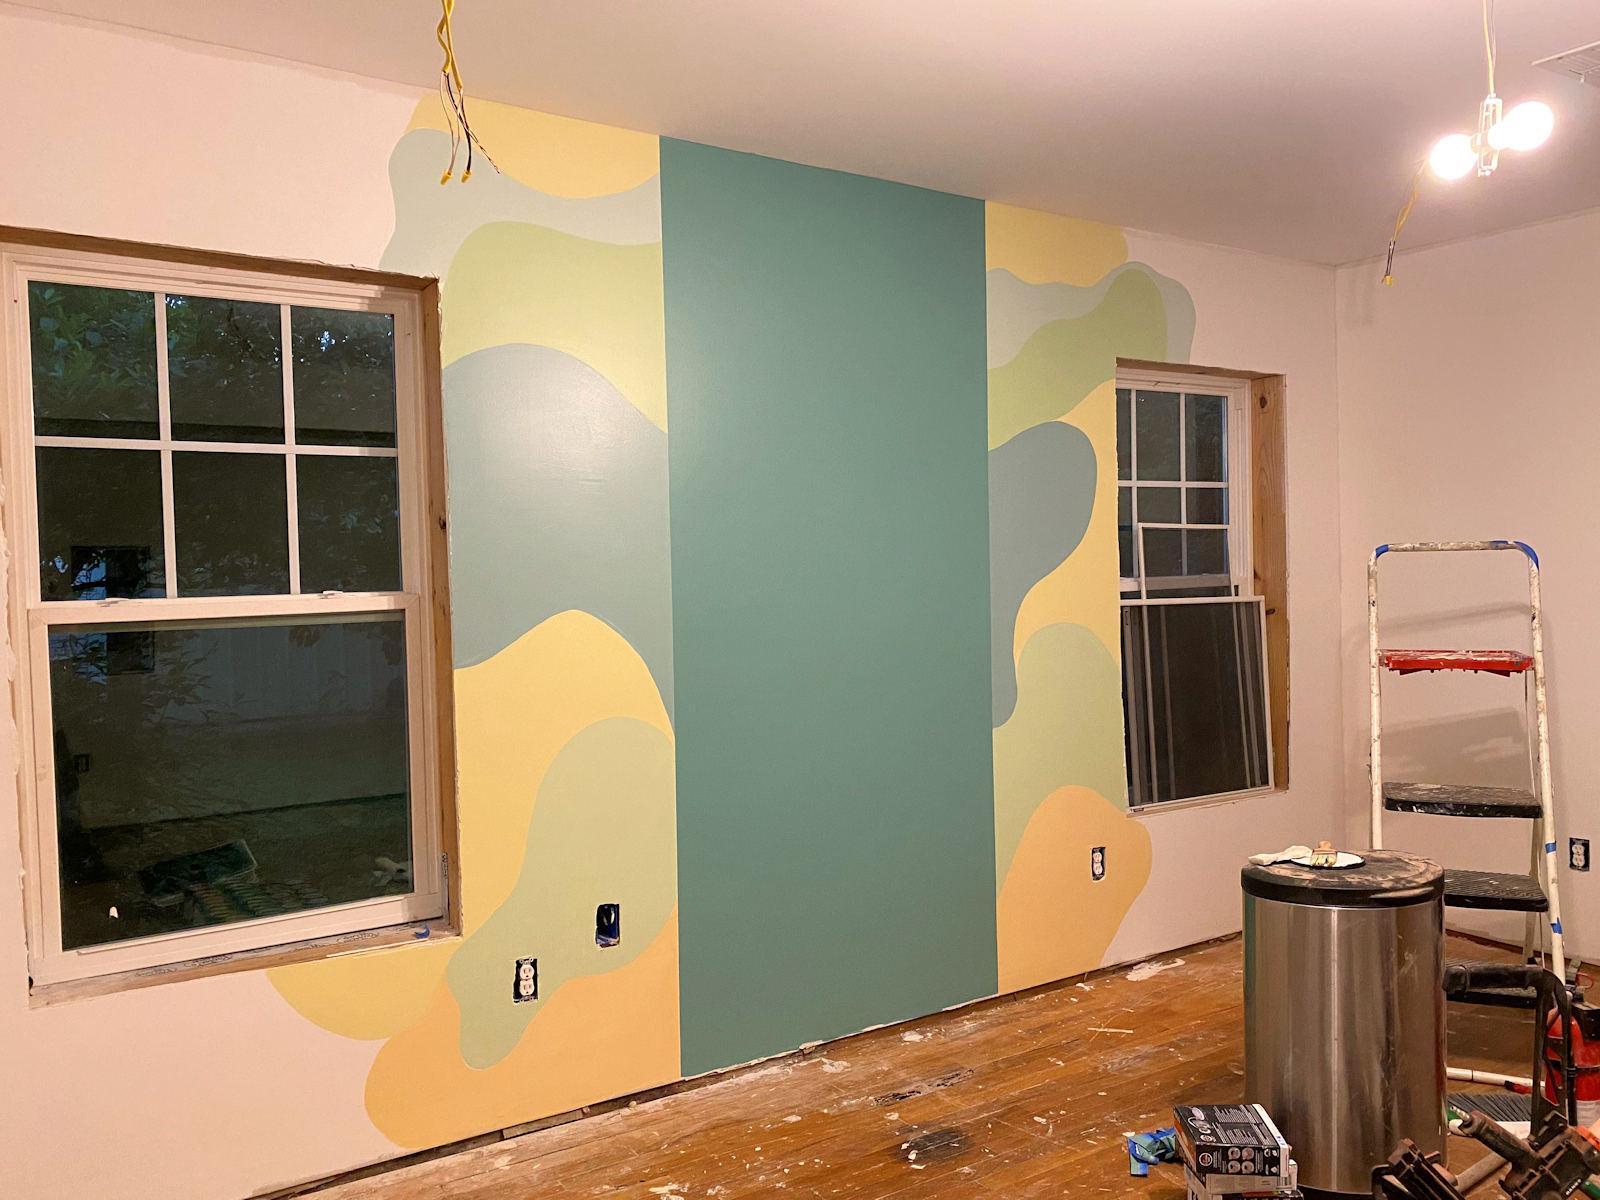 home gym walls with freeform design 3